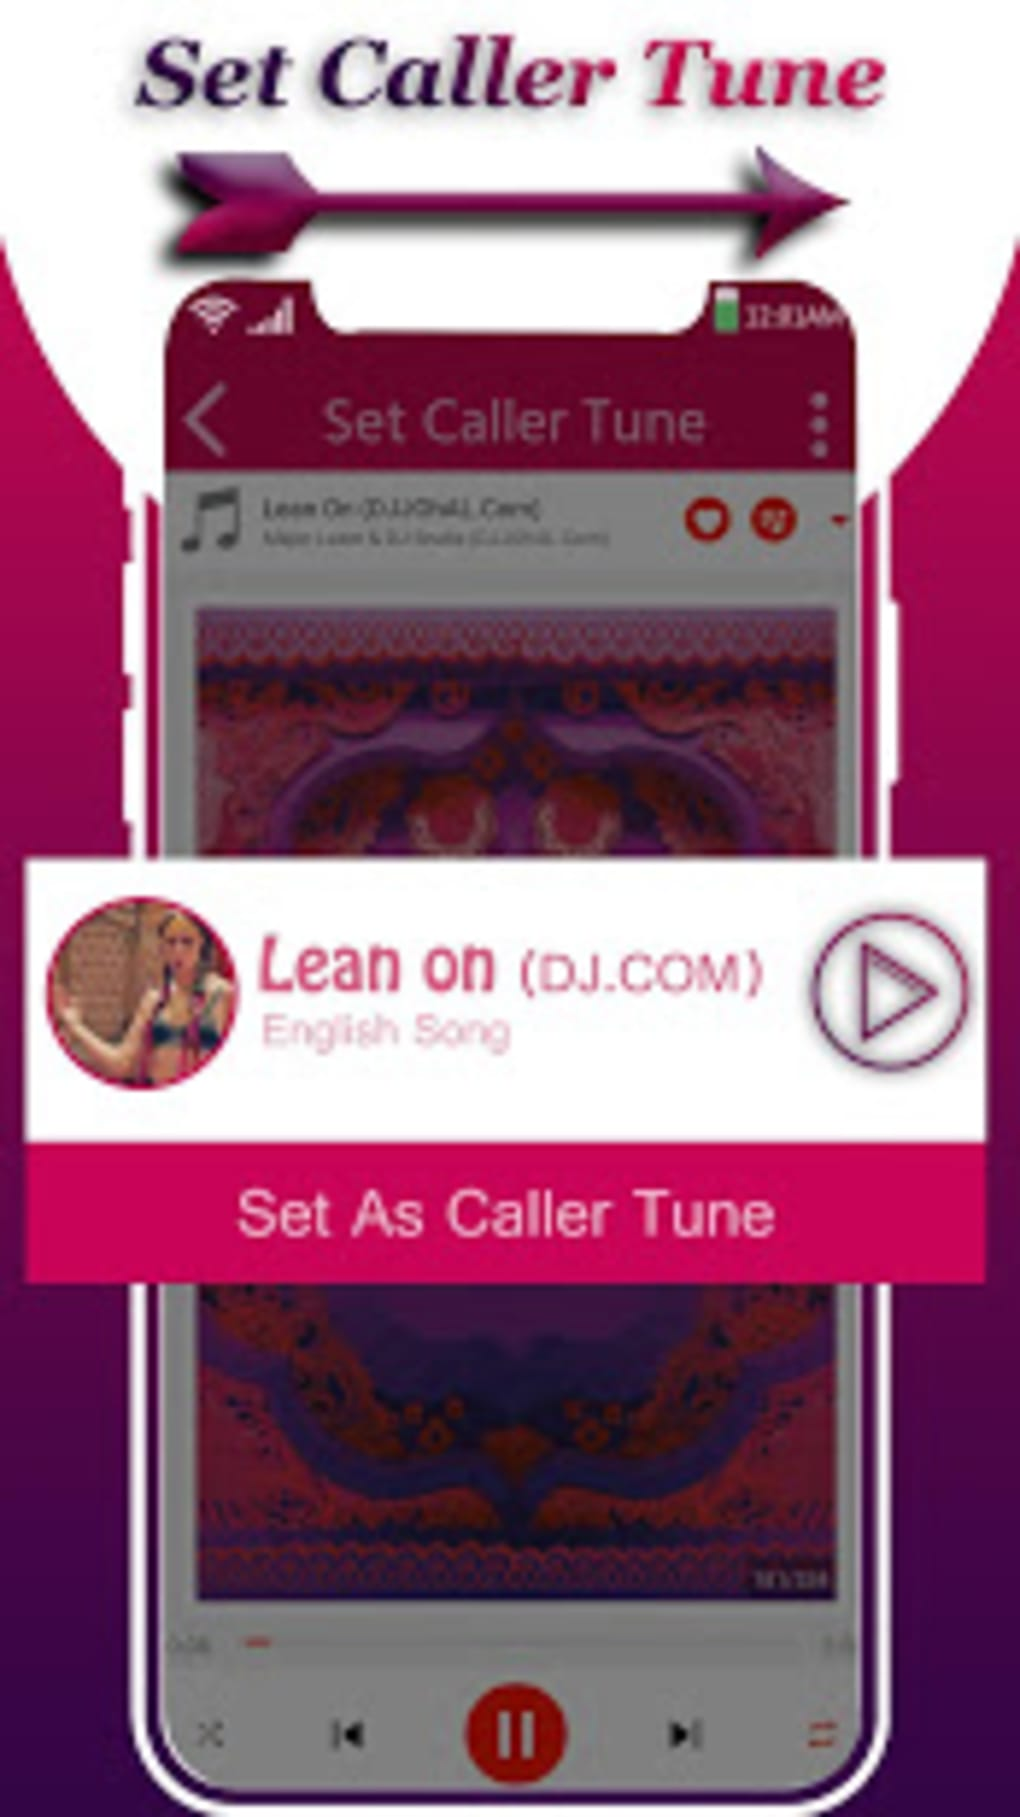 dj sound ringtone mp3 download